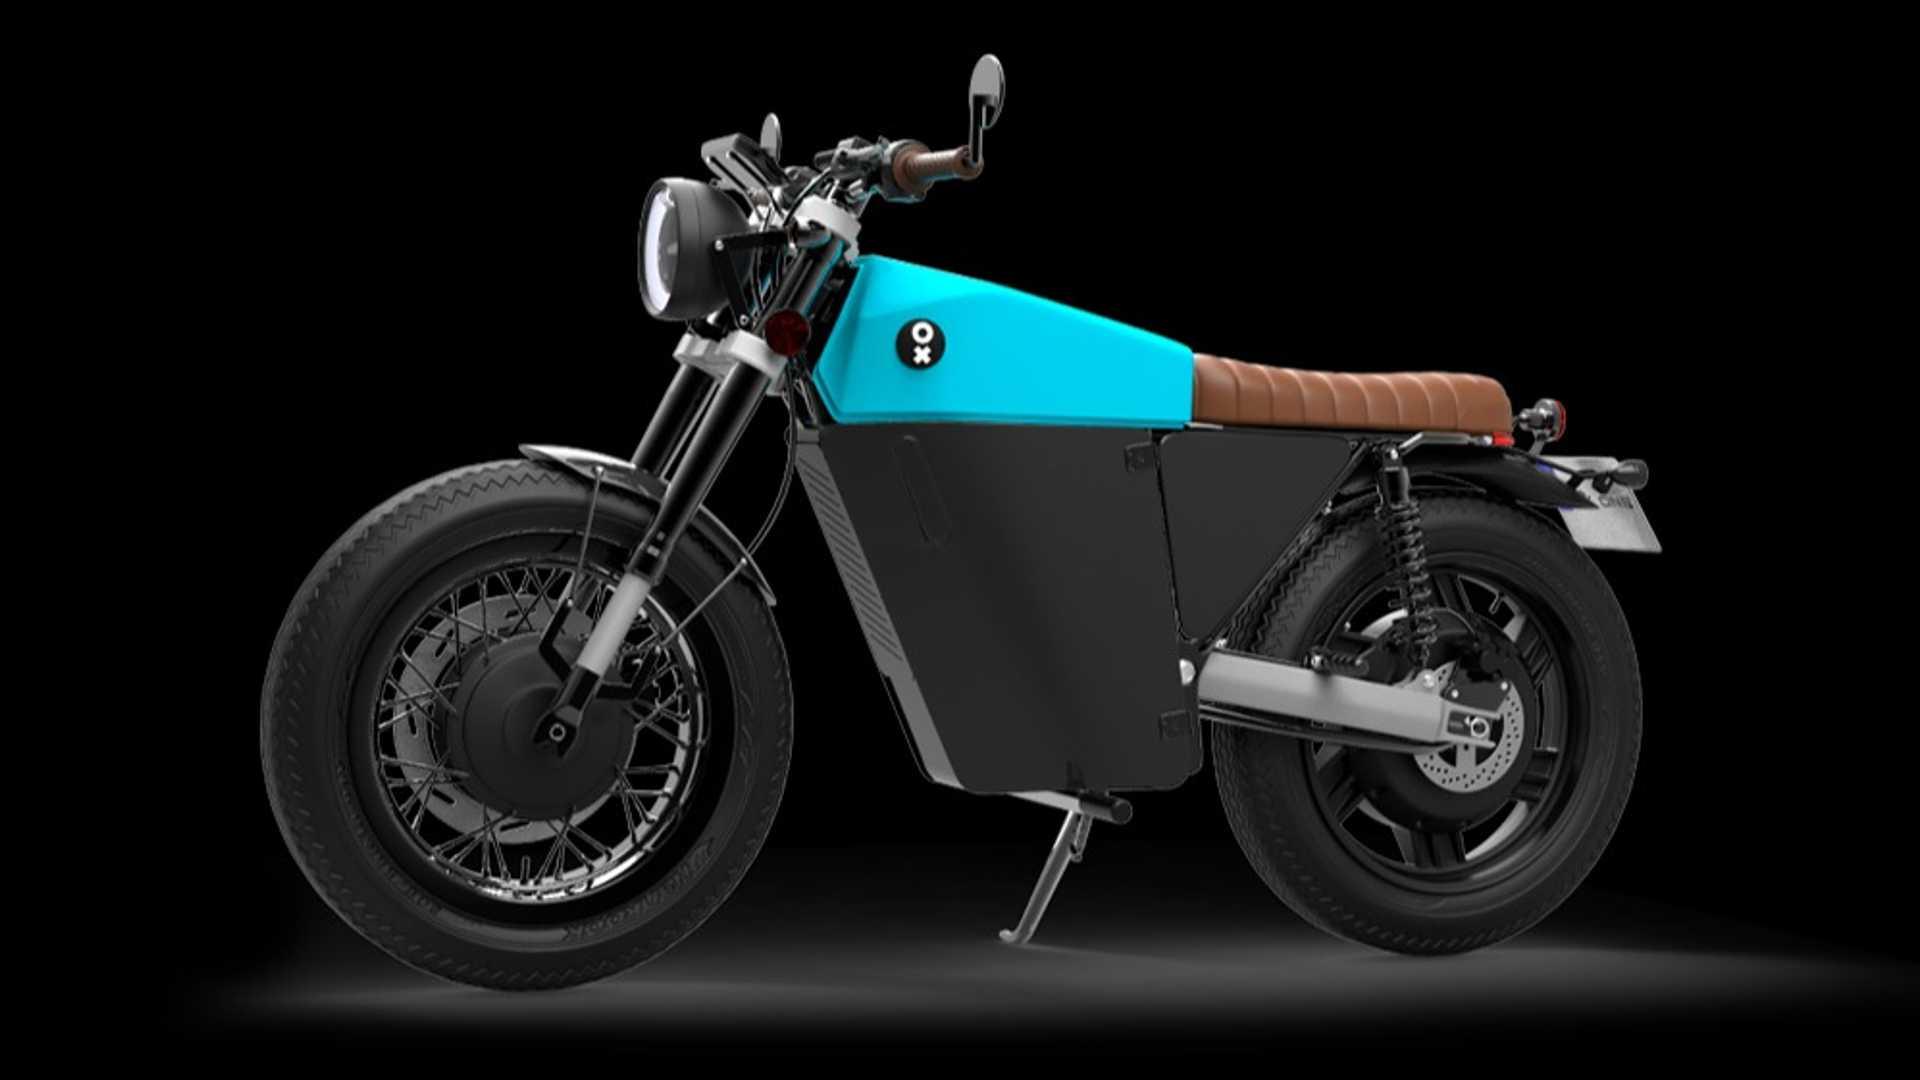 ox Motorcycles,ox motorcycles winnipeg, Ox Motorcycles,ox motorcycles electric,ox motorcycles españa,ox motorcycles review,ox motorcycles,ox motorcycles madrid,ox motorcycles opiniones, ox motorcycles costa rica,ox-one-electric-m...jpg,ox-one-electric-m.jpg,ox-one-electric-m.jpg